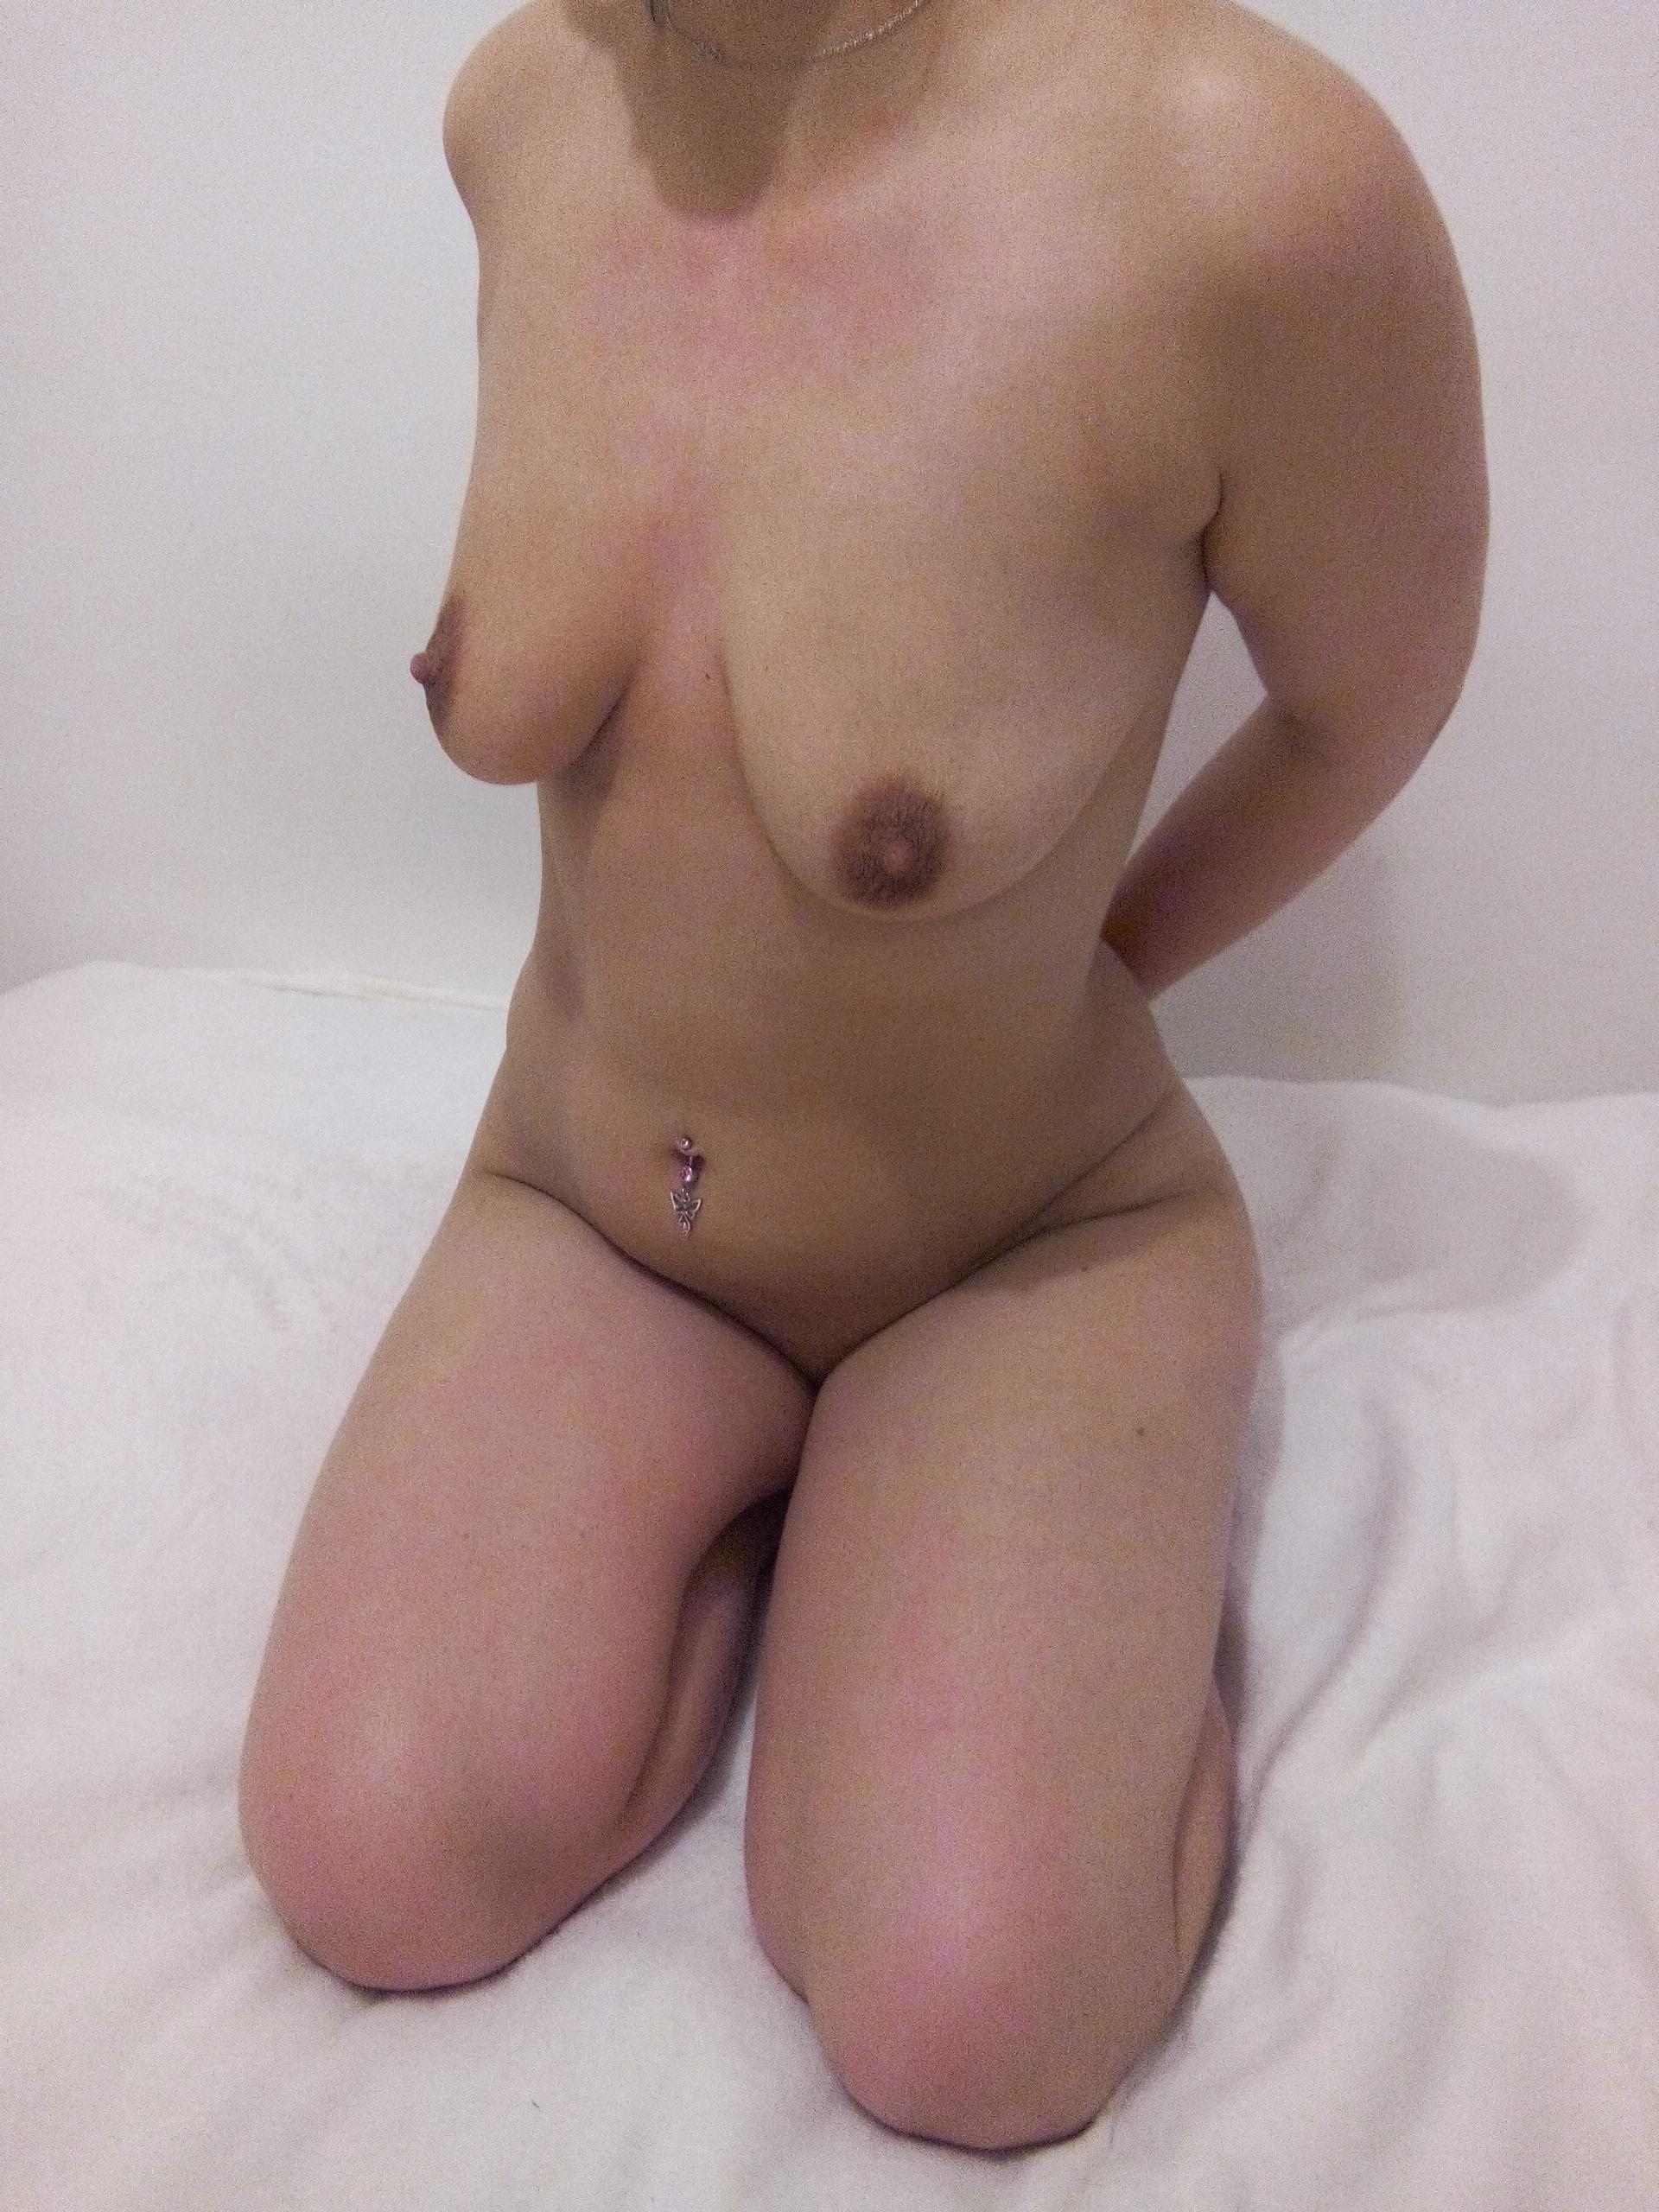 Femme lesbienne chaude-1481